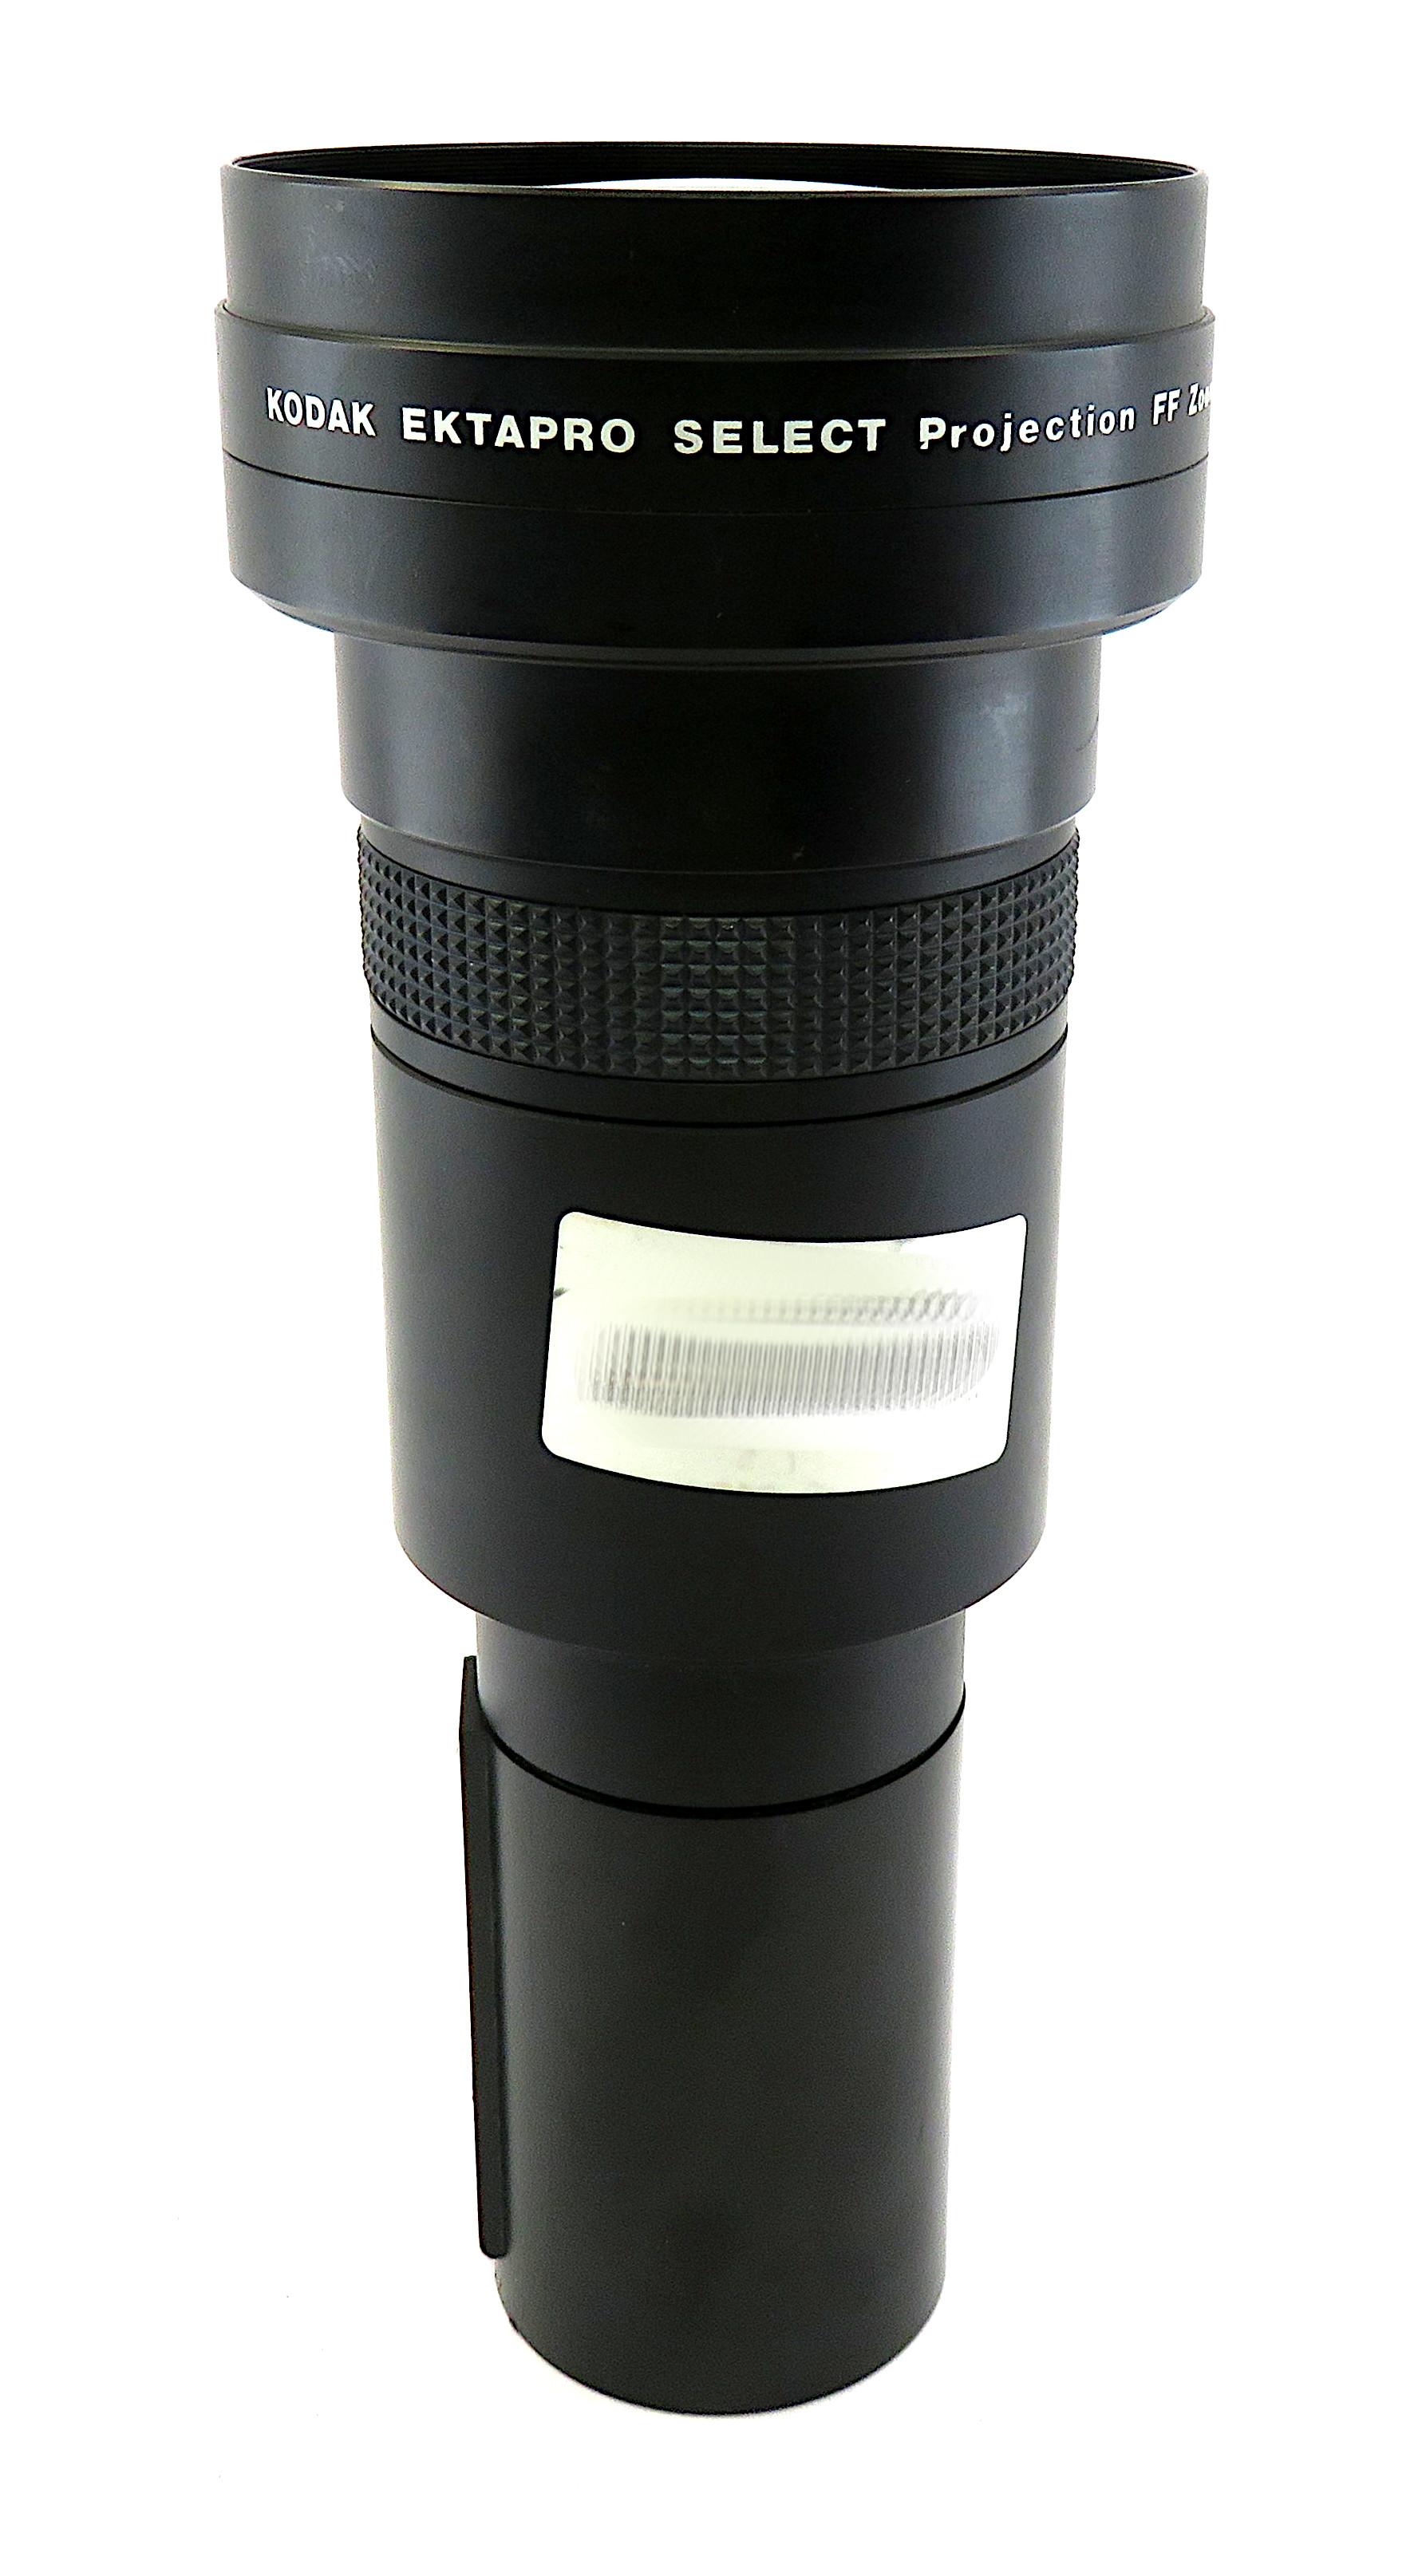 Kodak Ektapro Select Projection FF Zoom Lens 200-300 mm f / 3,5